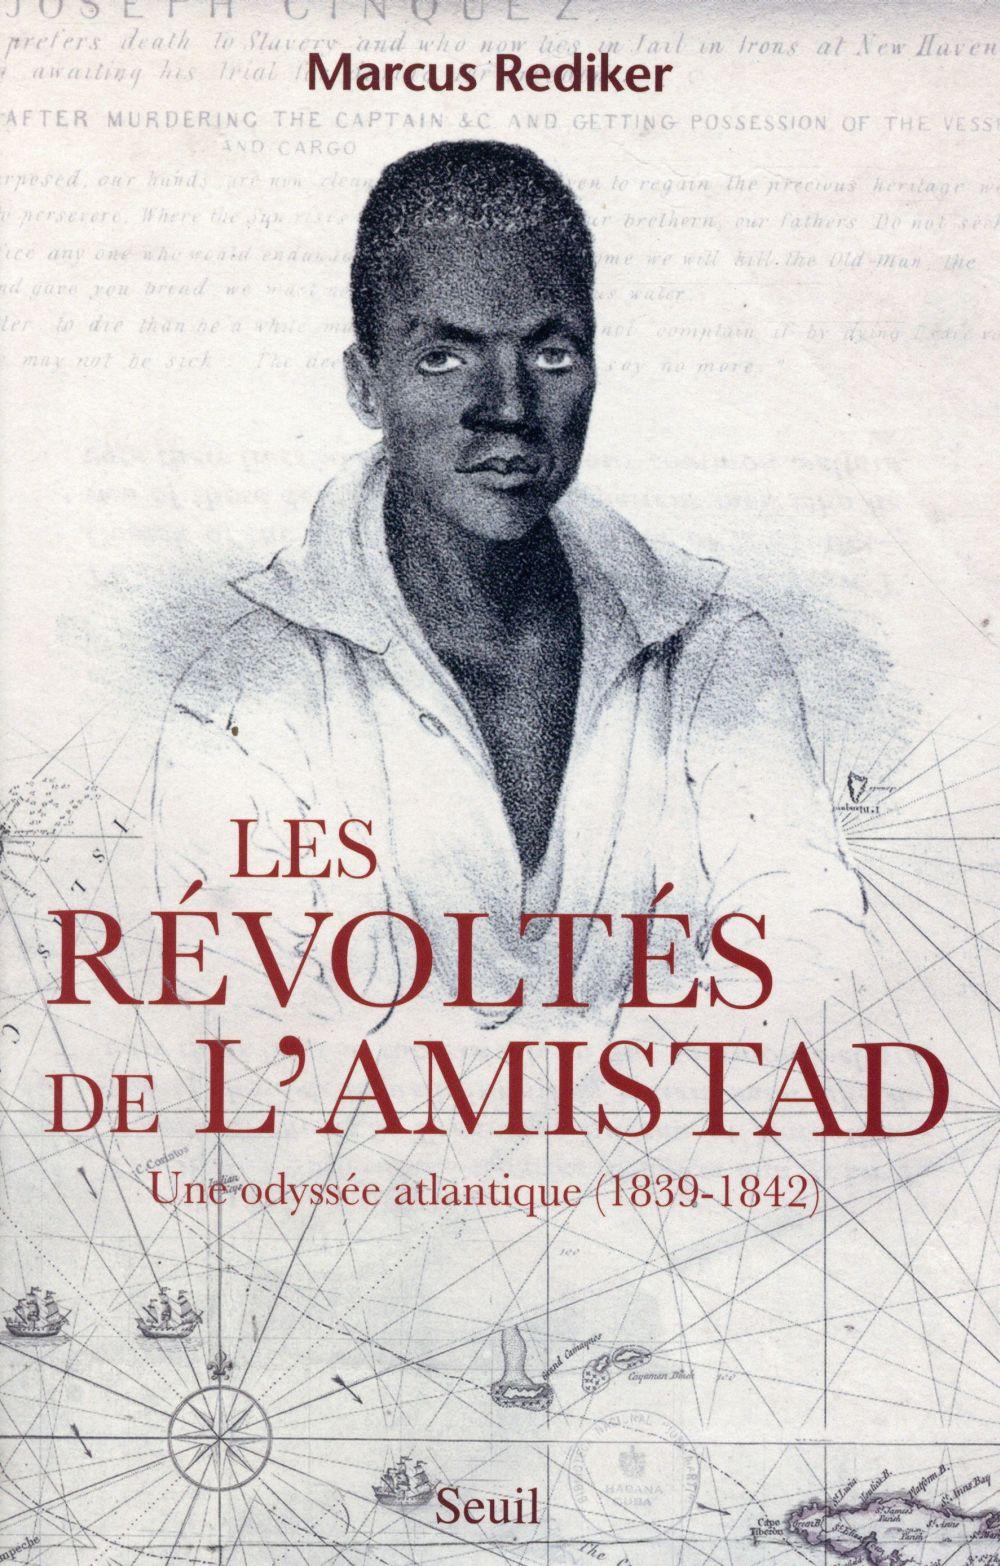 LES REVOLTES DE L'AMISTAD  -  UNE ODYSSEE ATLANTIQUE, 1839-1842